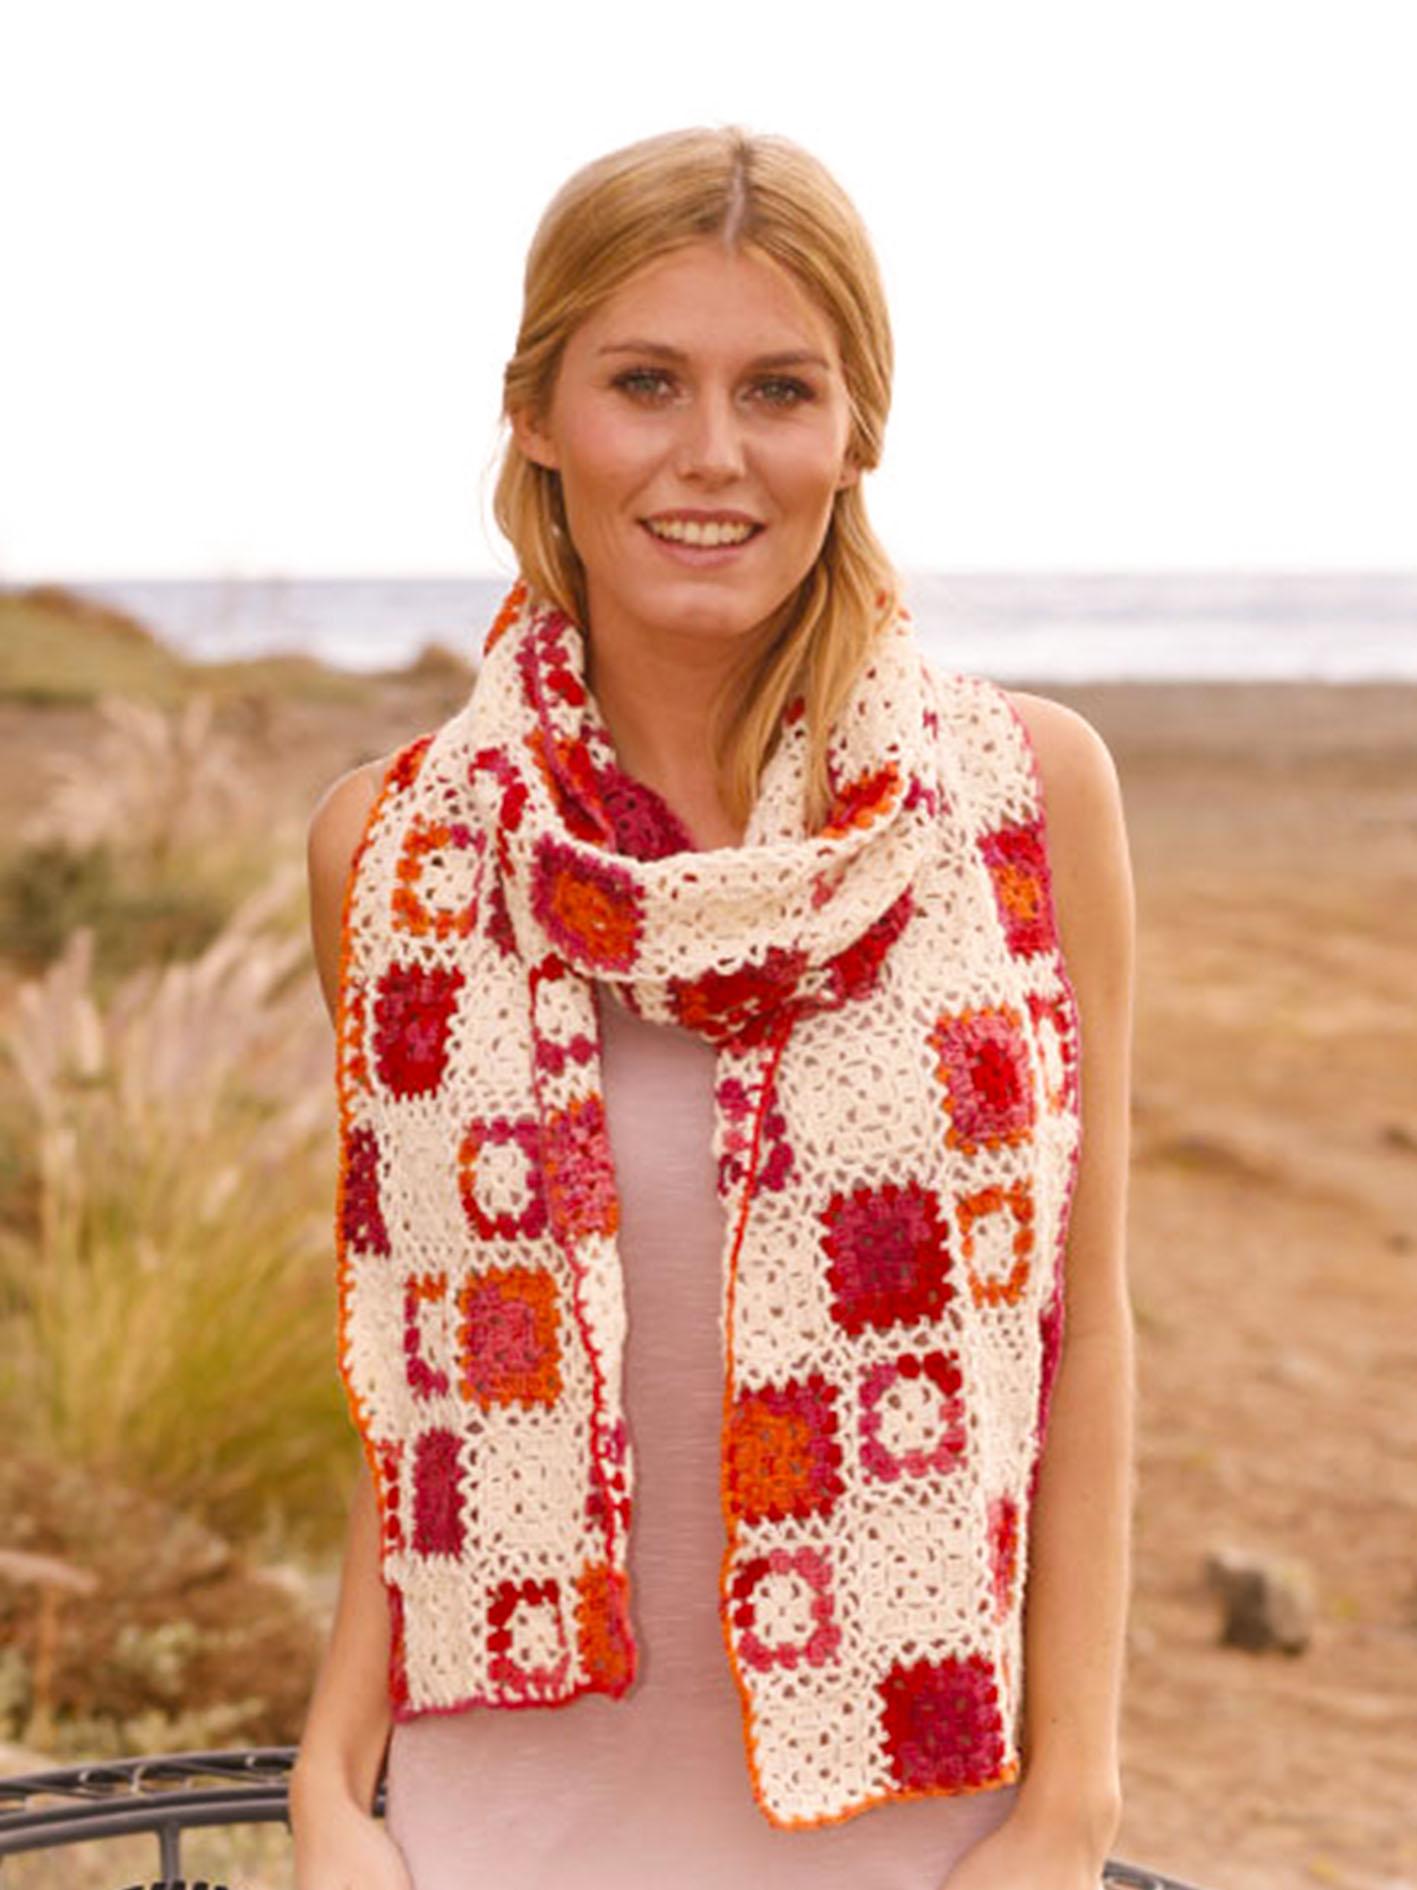 crochet-scarves-how-to-make-them-step-by-step